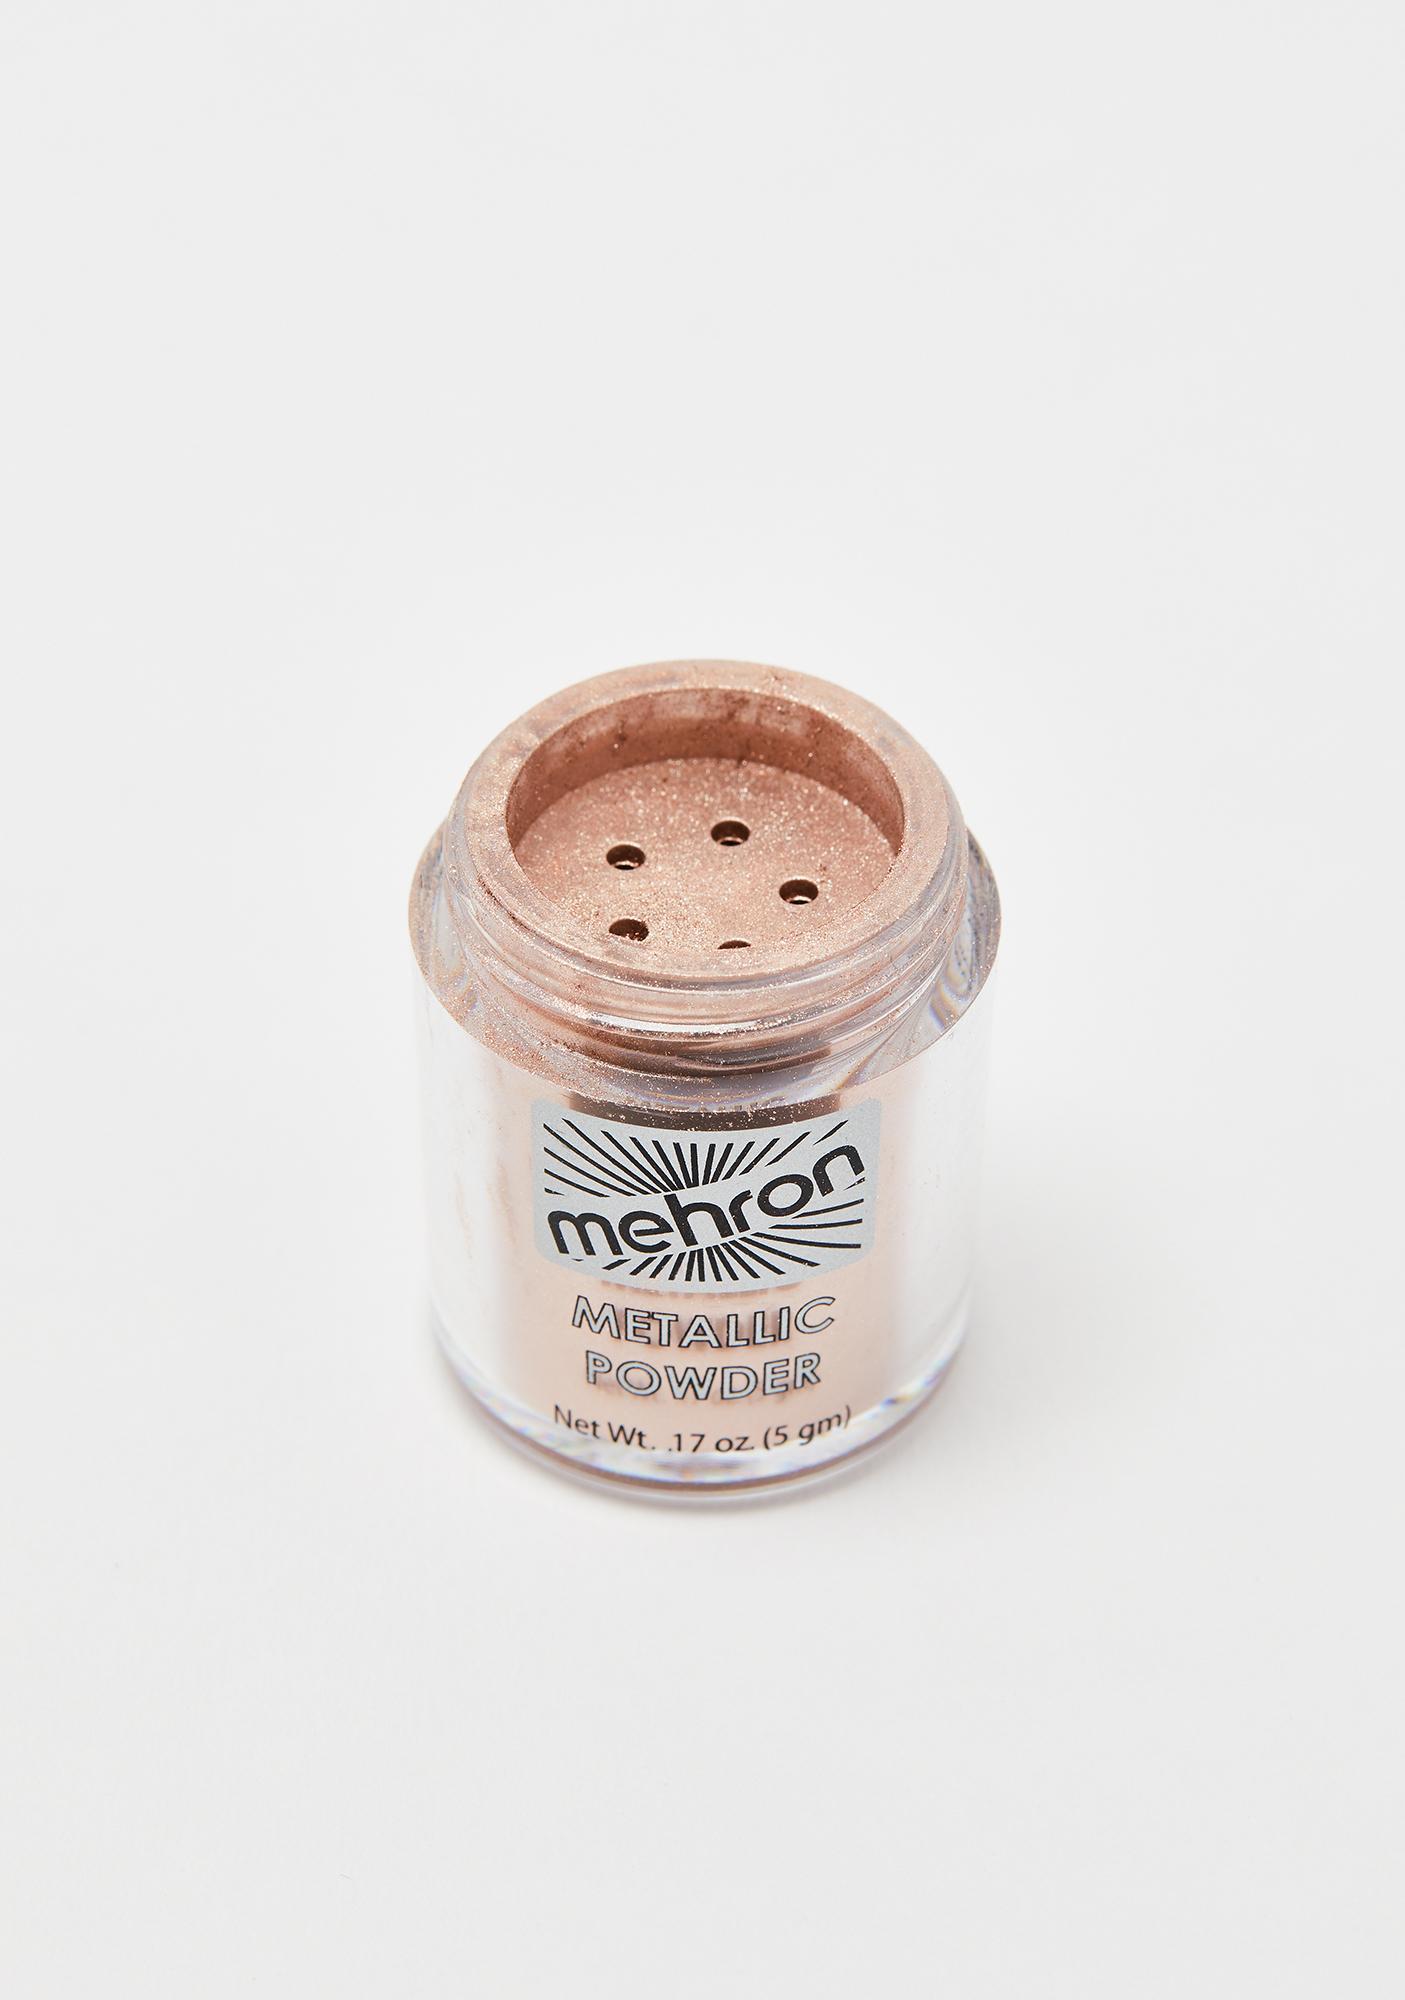 Mehron Rose Gold Metallic Powder With Mixing Liquid